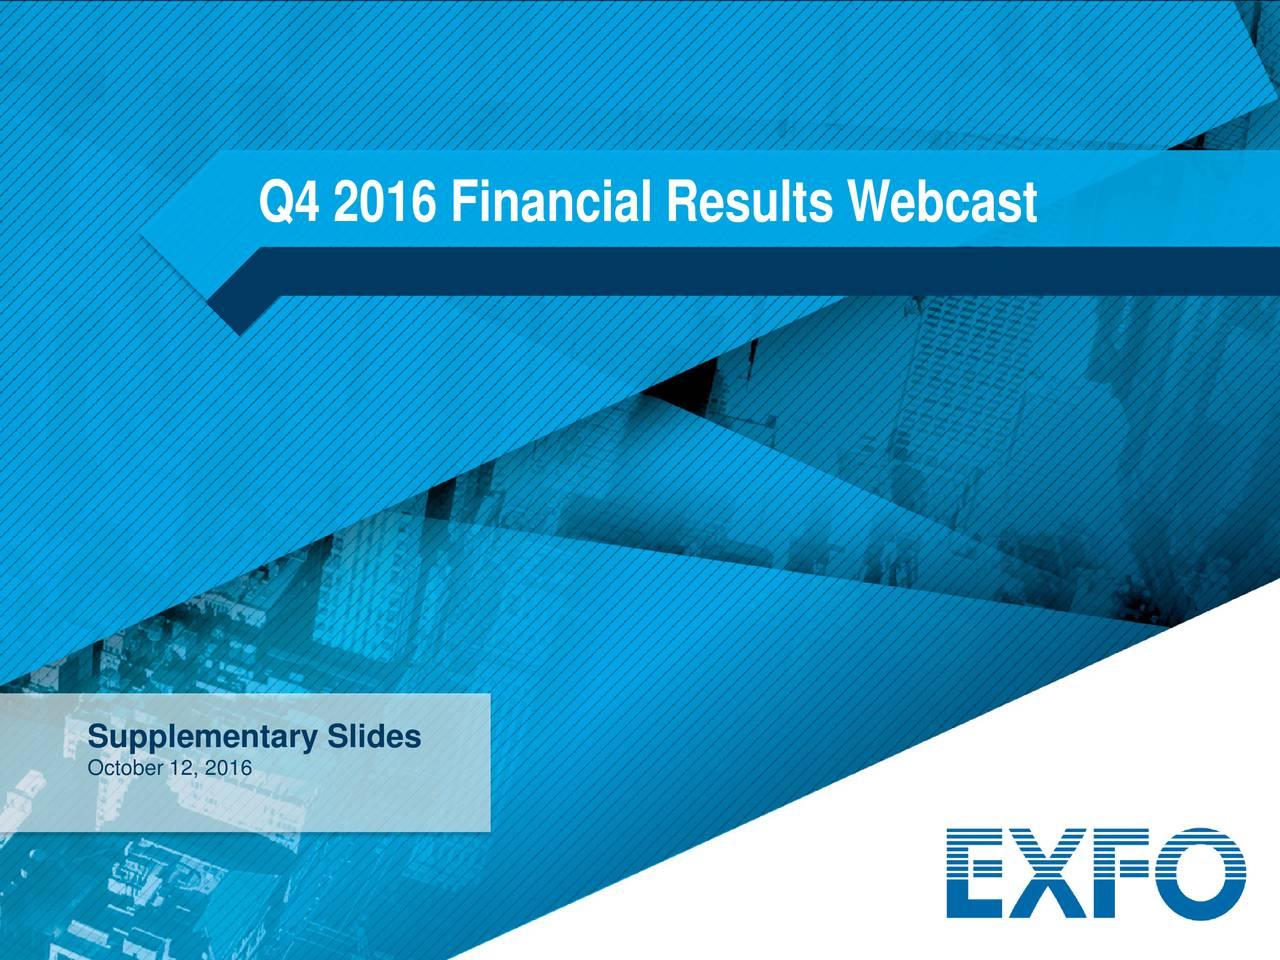 Supplementary Slides October 12, 2016